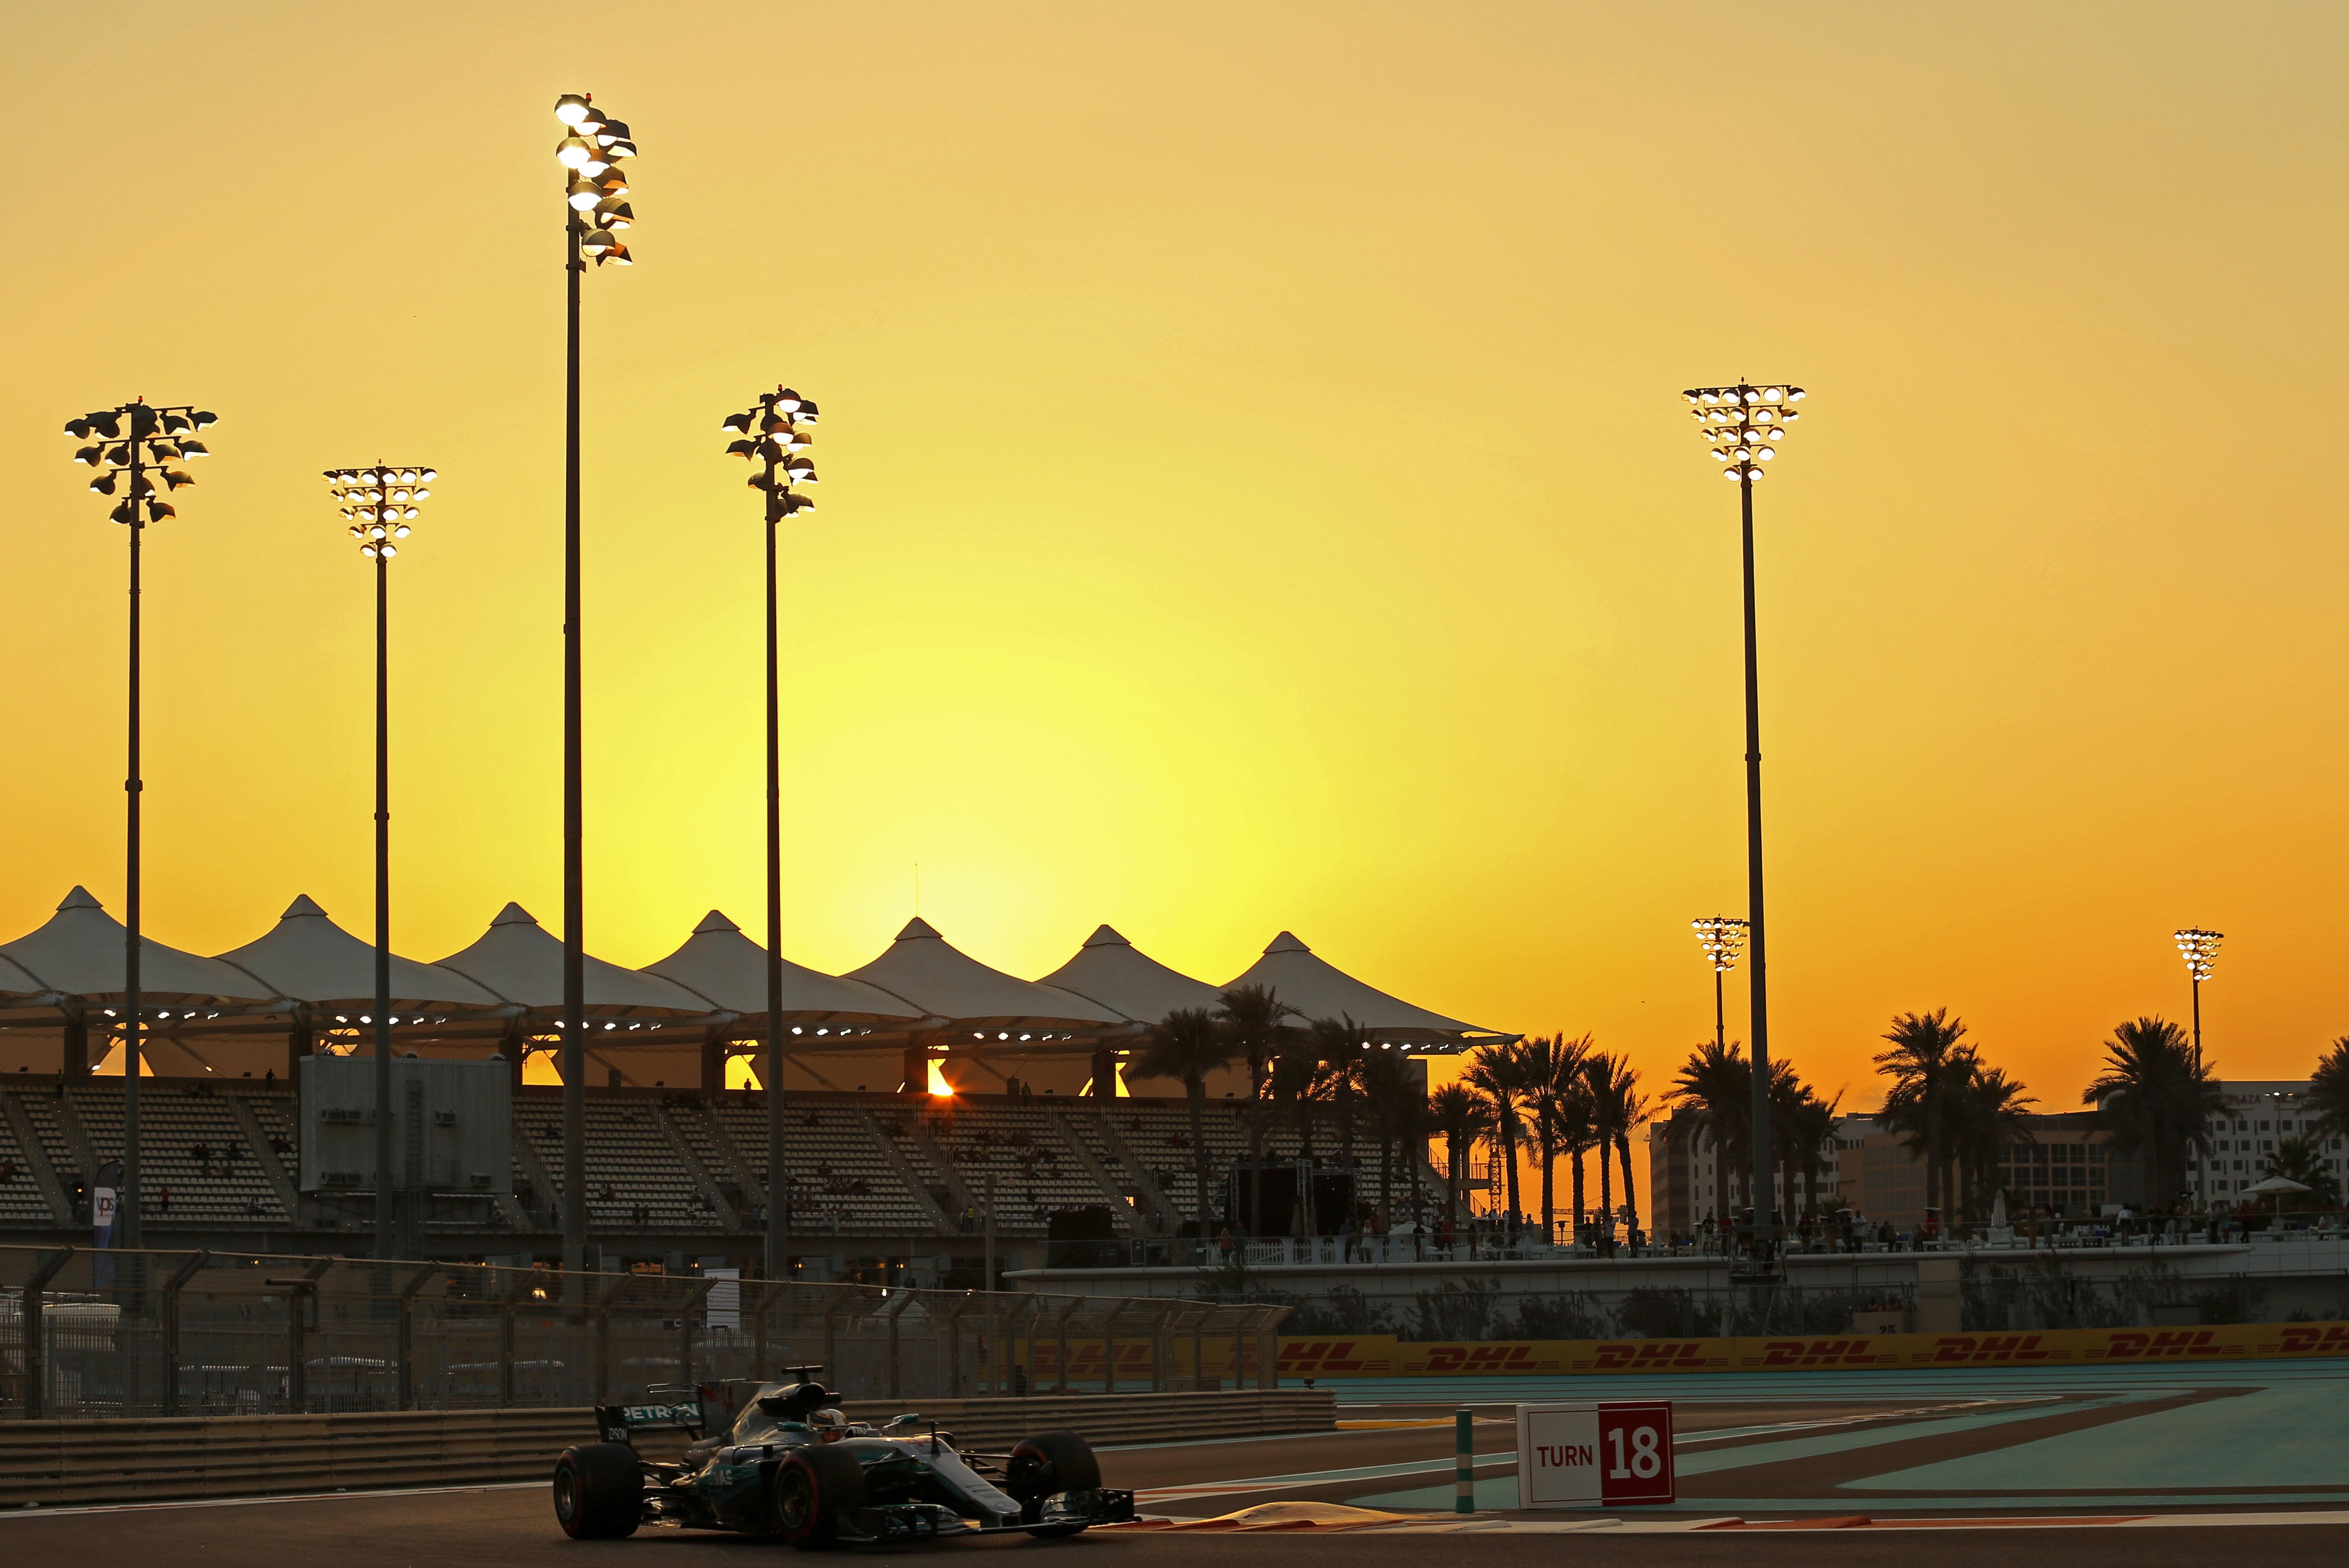 Formula One World Championship 2017, Round 20, Abu Dhabi Grand Prix, Abu Dhabi, United Arab Emirates, Friday 24 November 2017 – Lewis Hamilton (GBR) Mercedes AMG F1